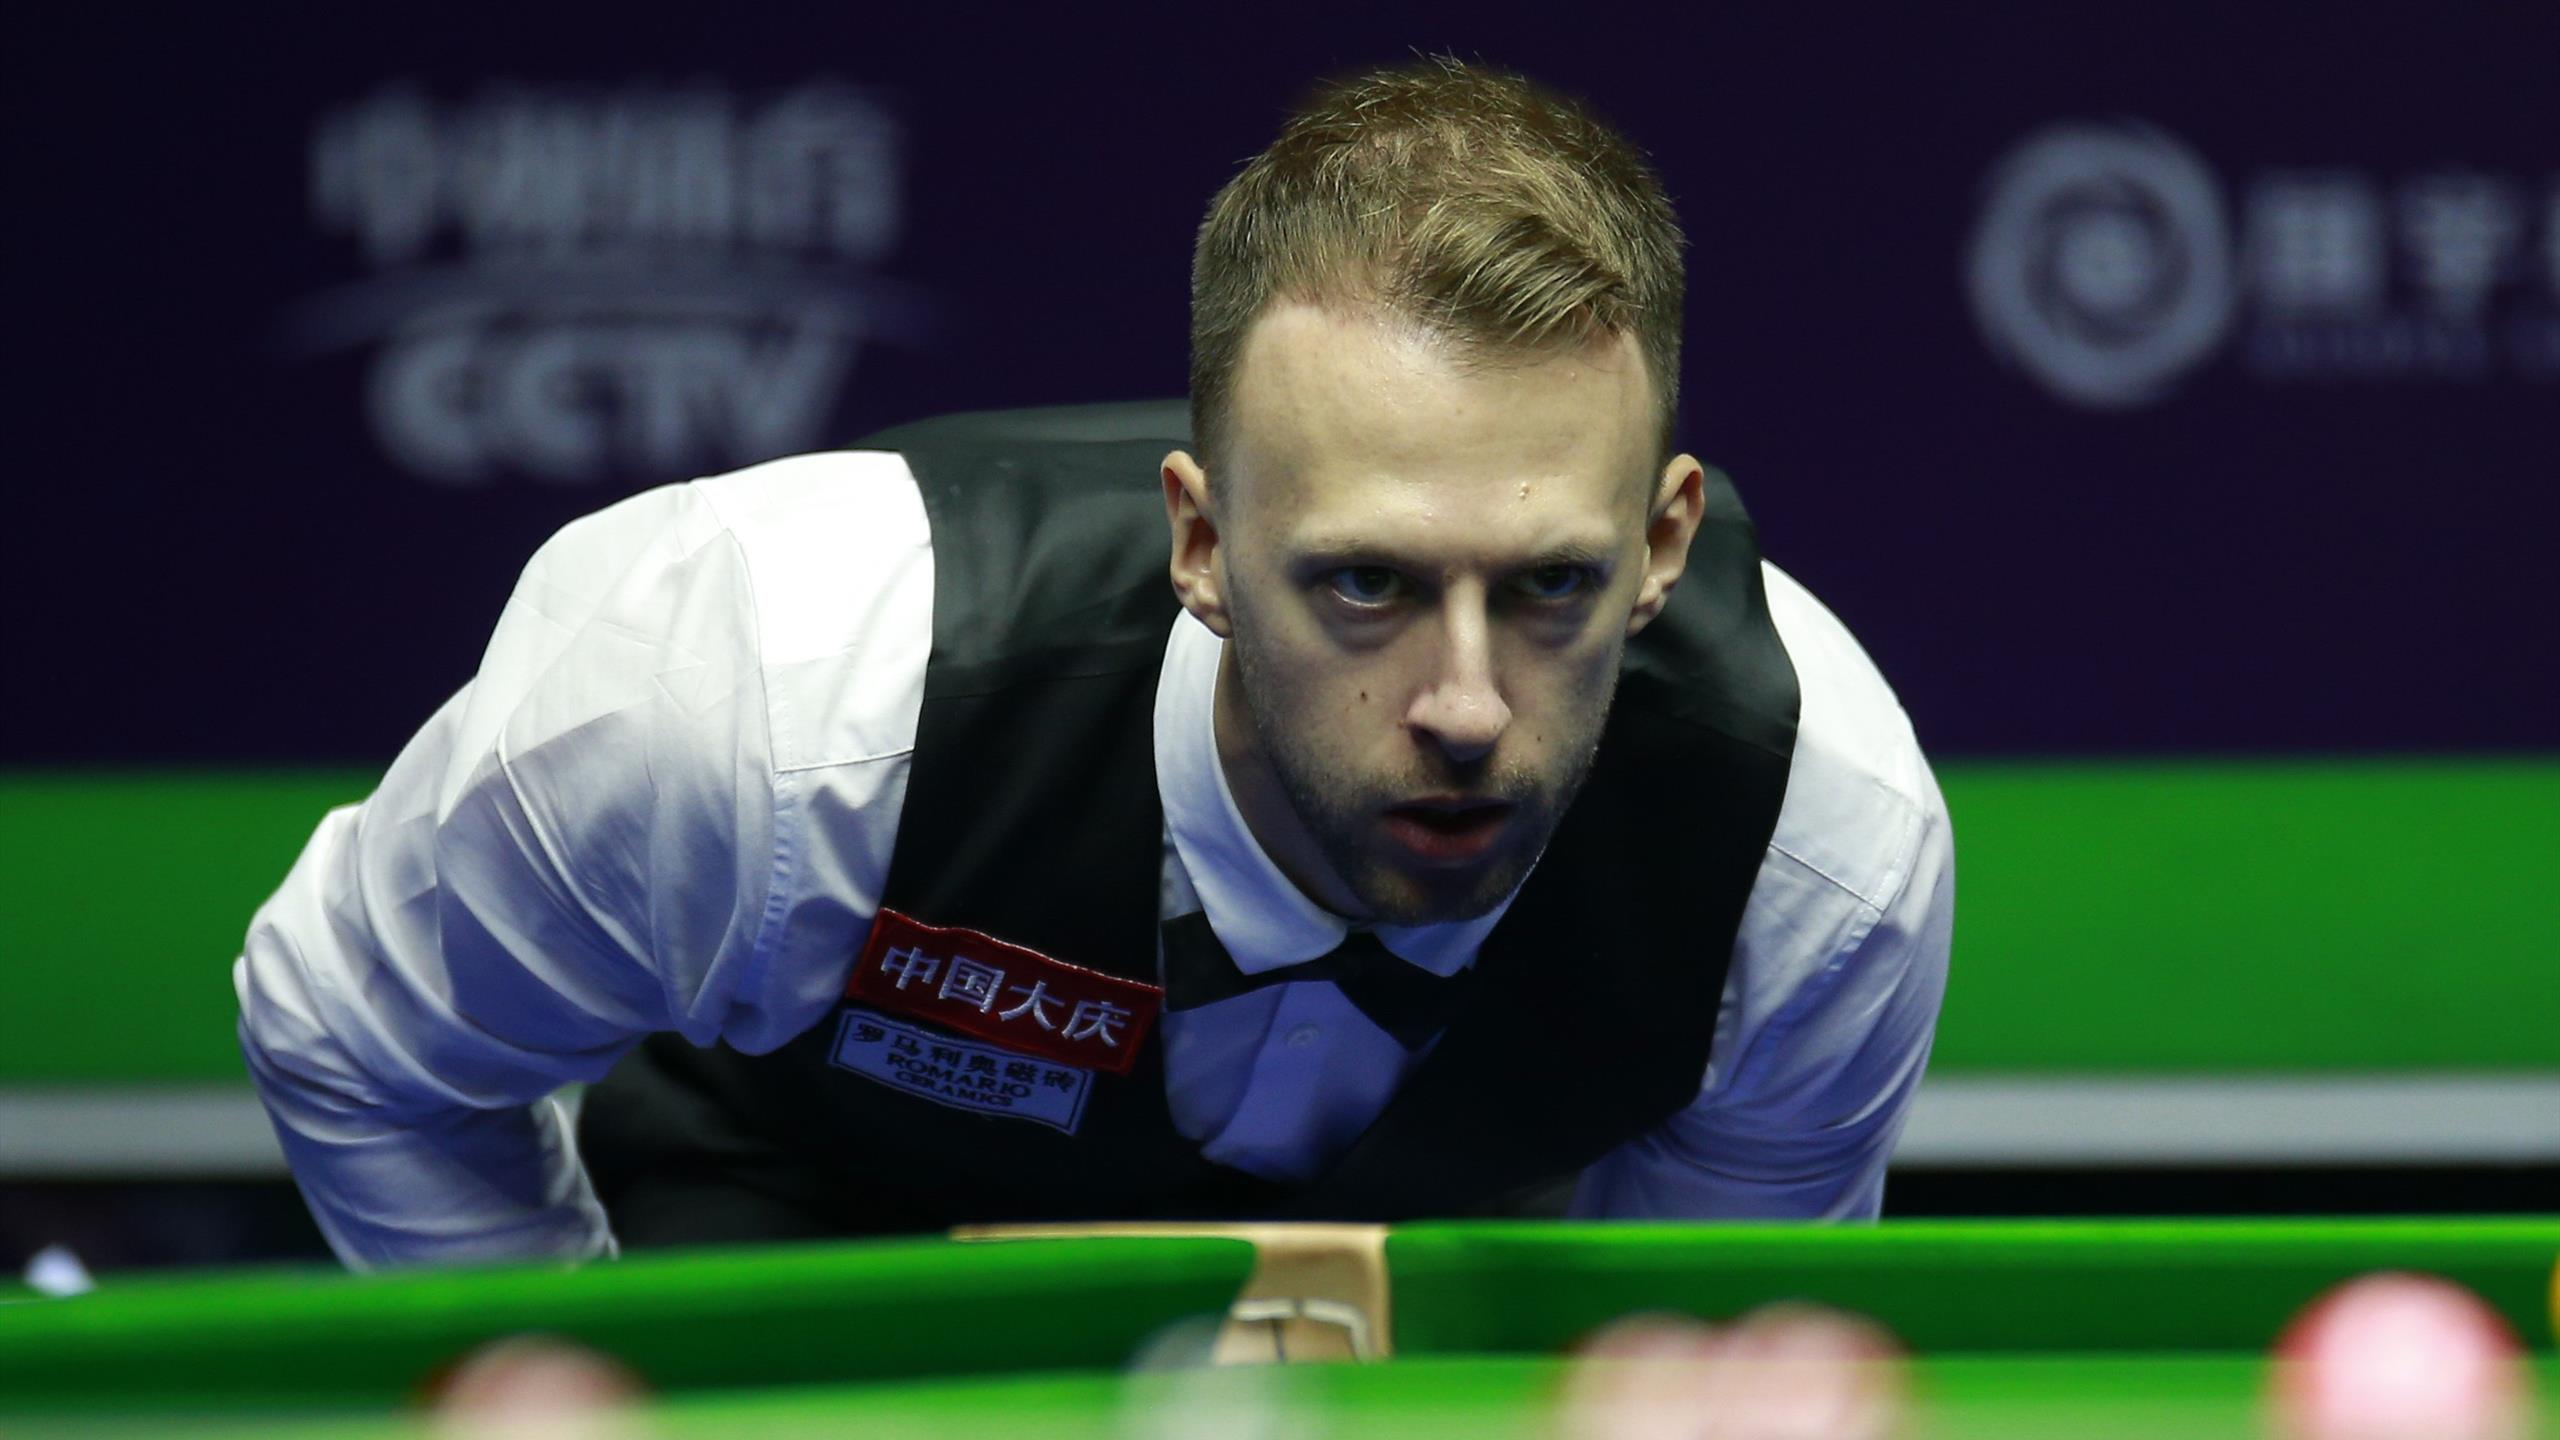 Snooker Championship League 2021